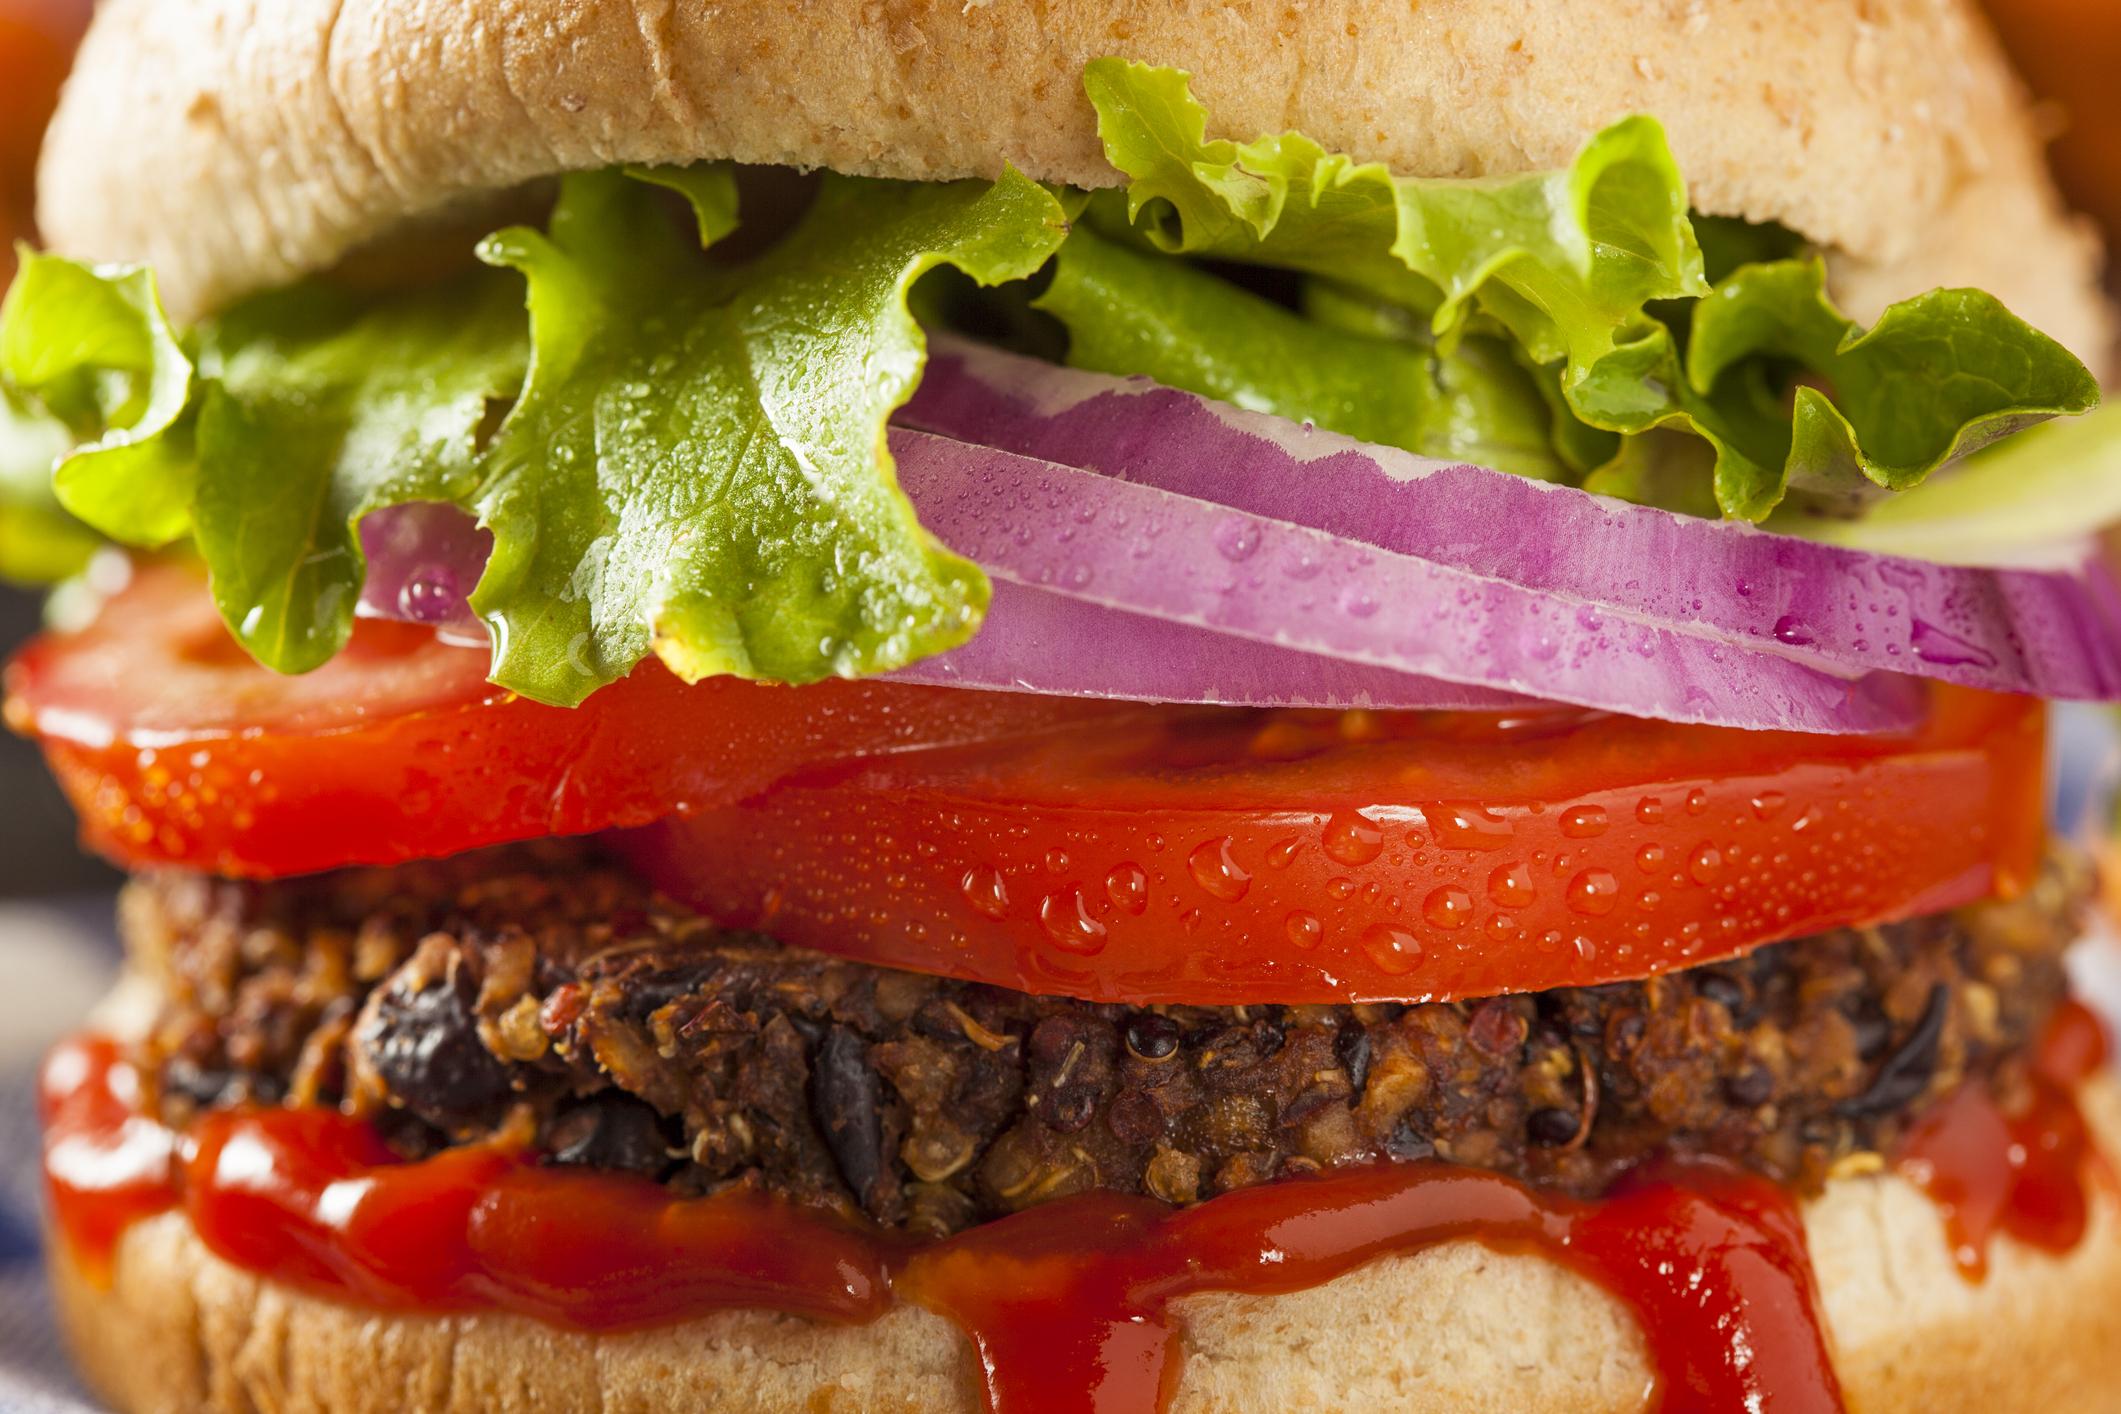 © Bhofack2 | Dreamstime.com - Homemade Healthy Vegetarian Quinoa Burger Photo